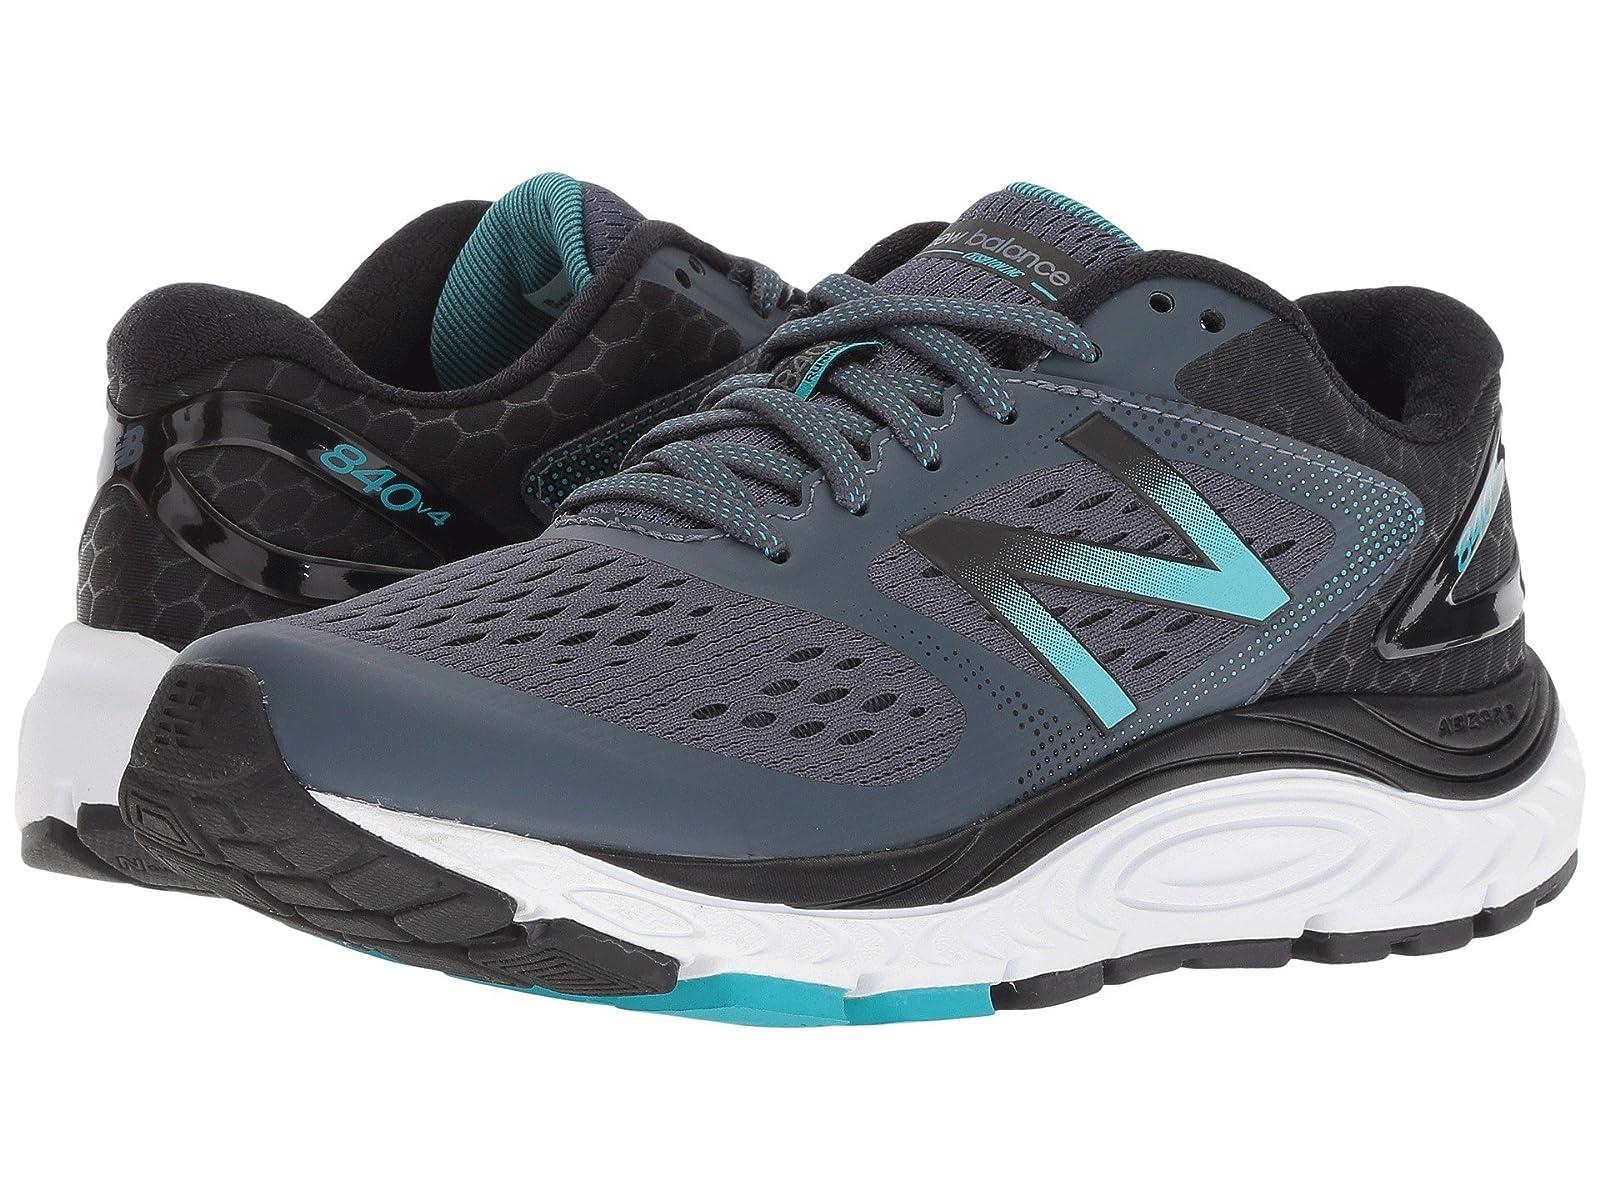 New Balance 840v4Atmospheric grades have affordable shoes